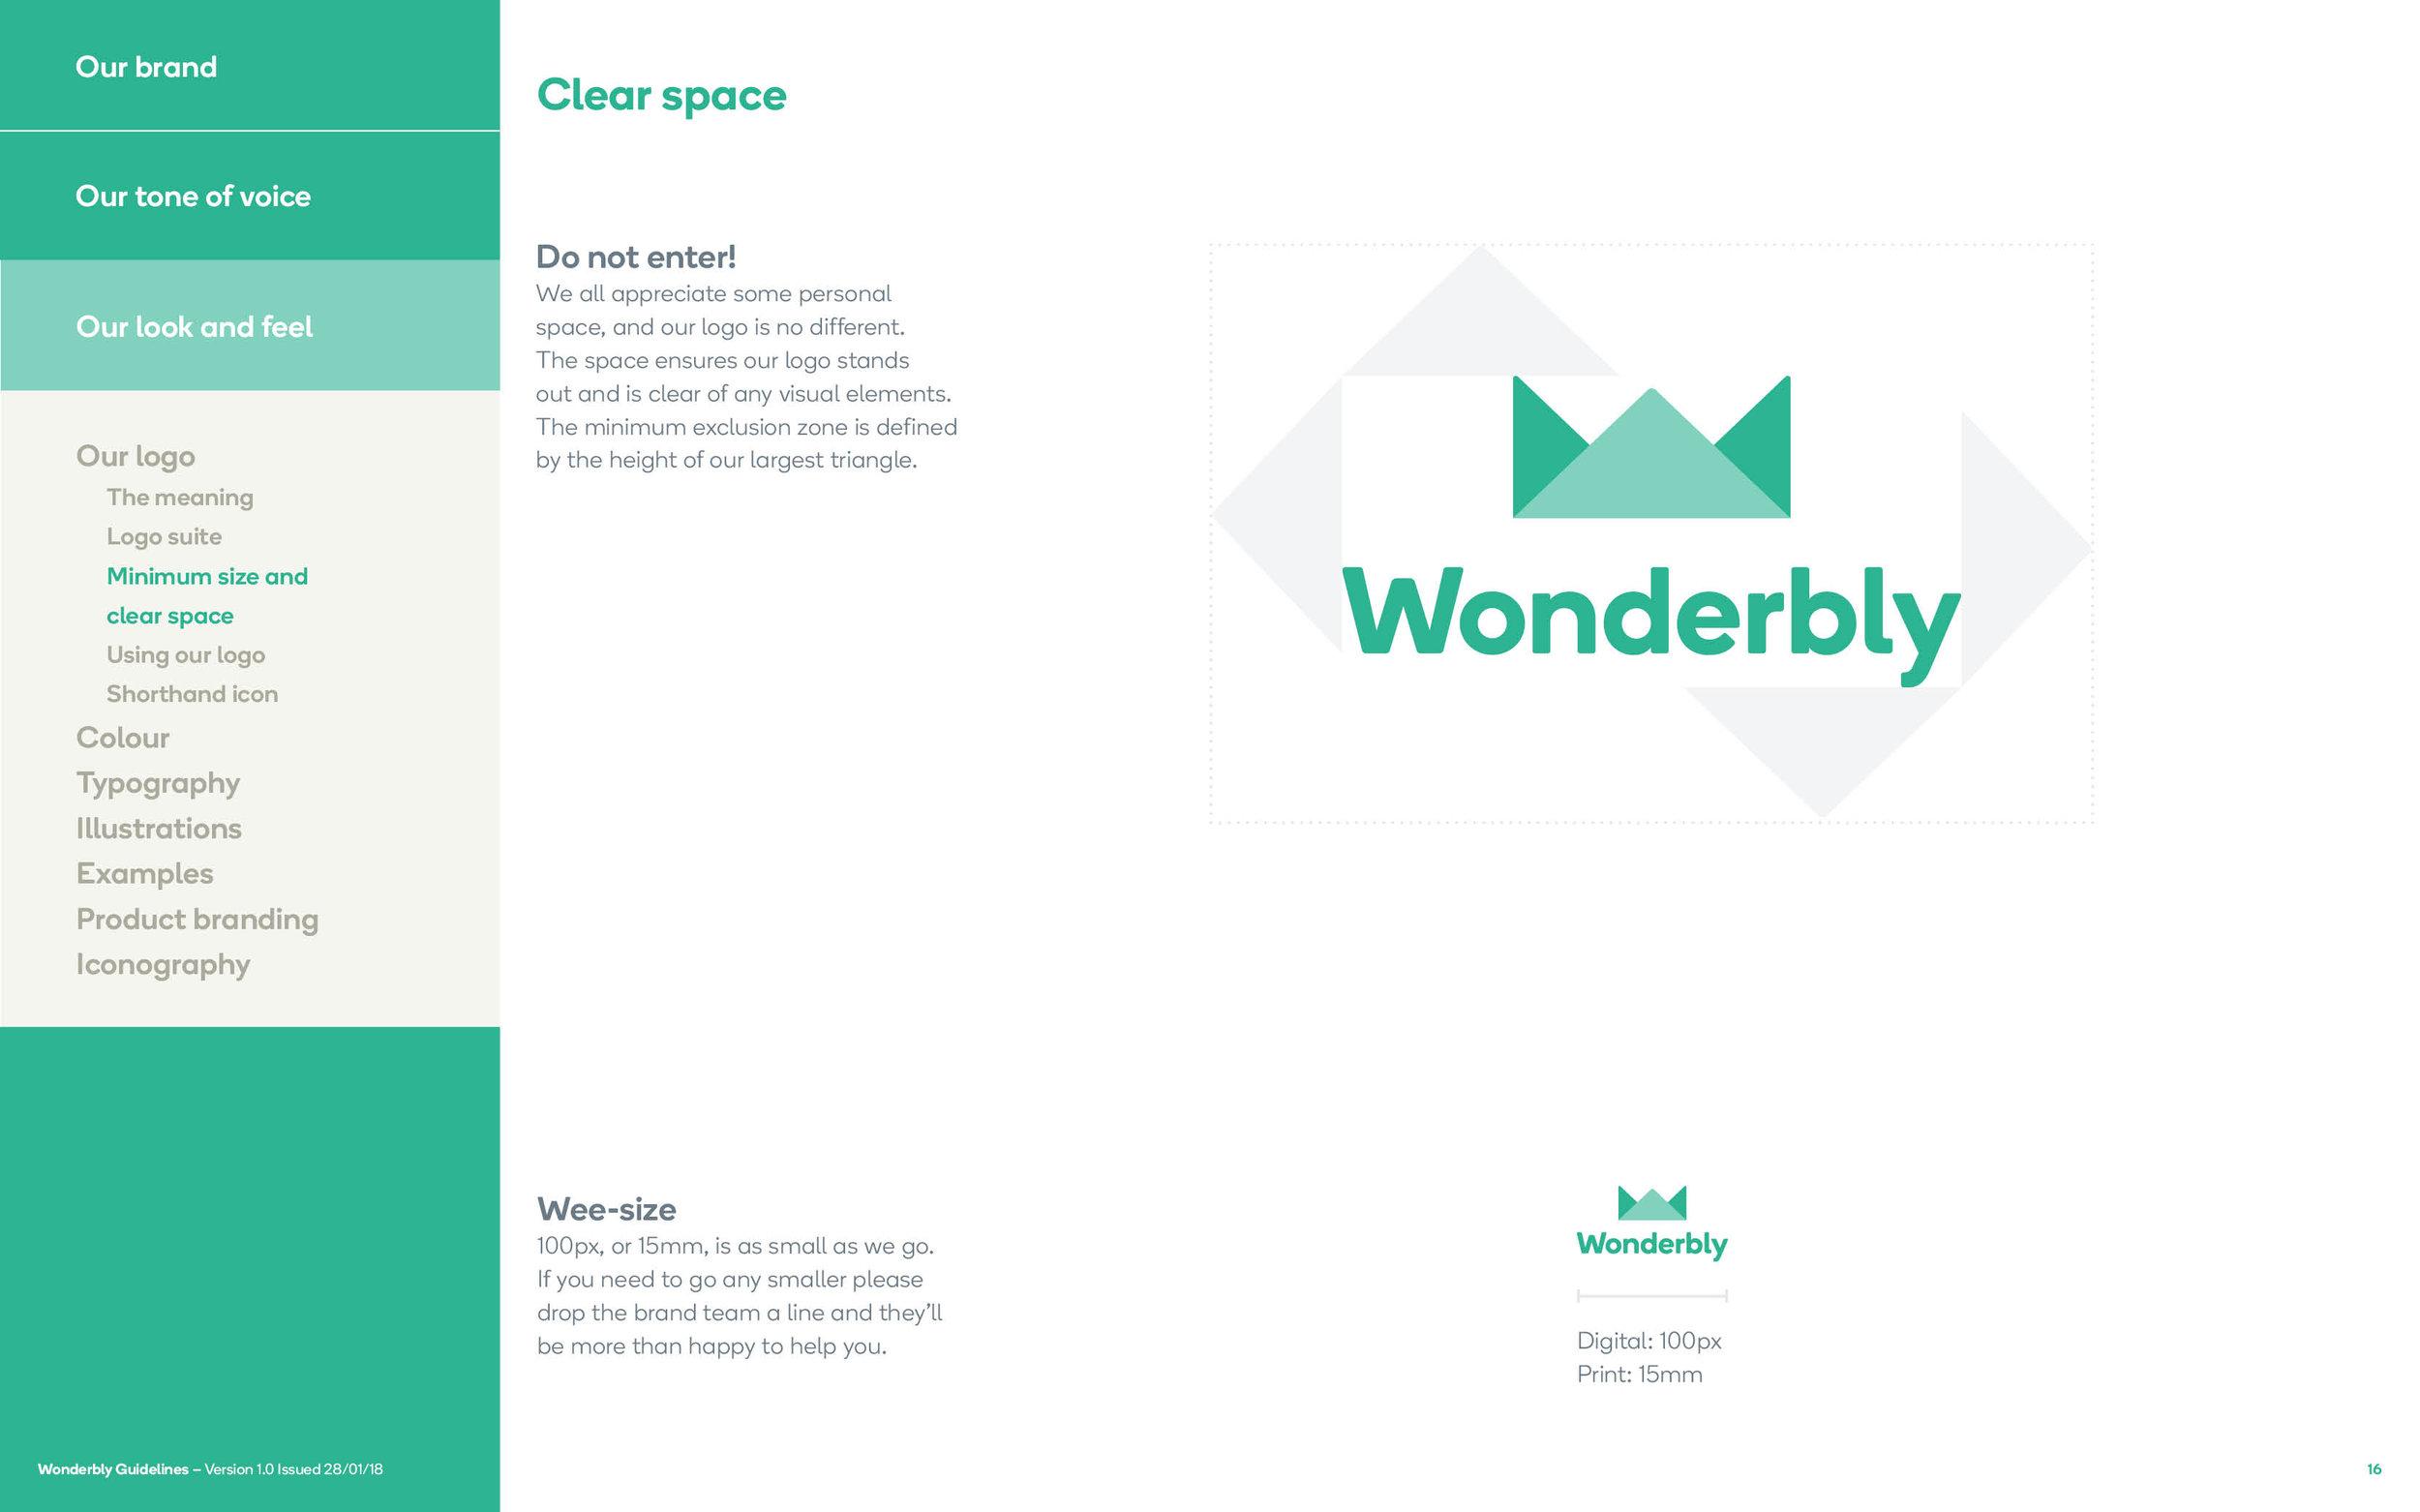 Wonderbly_Guidelines_v816.jpg